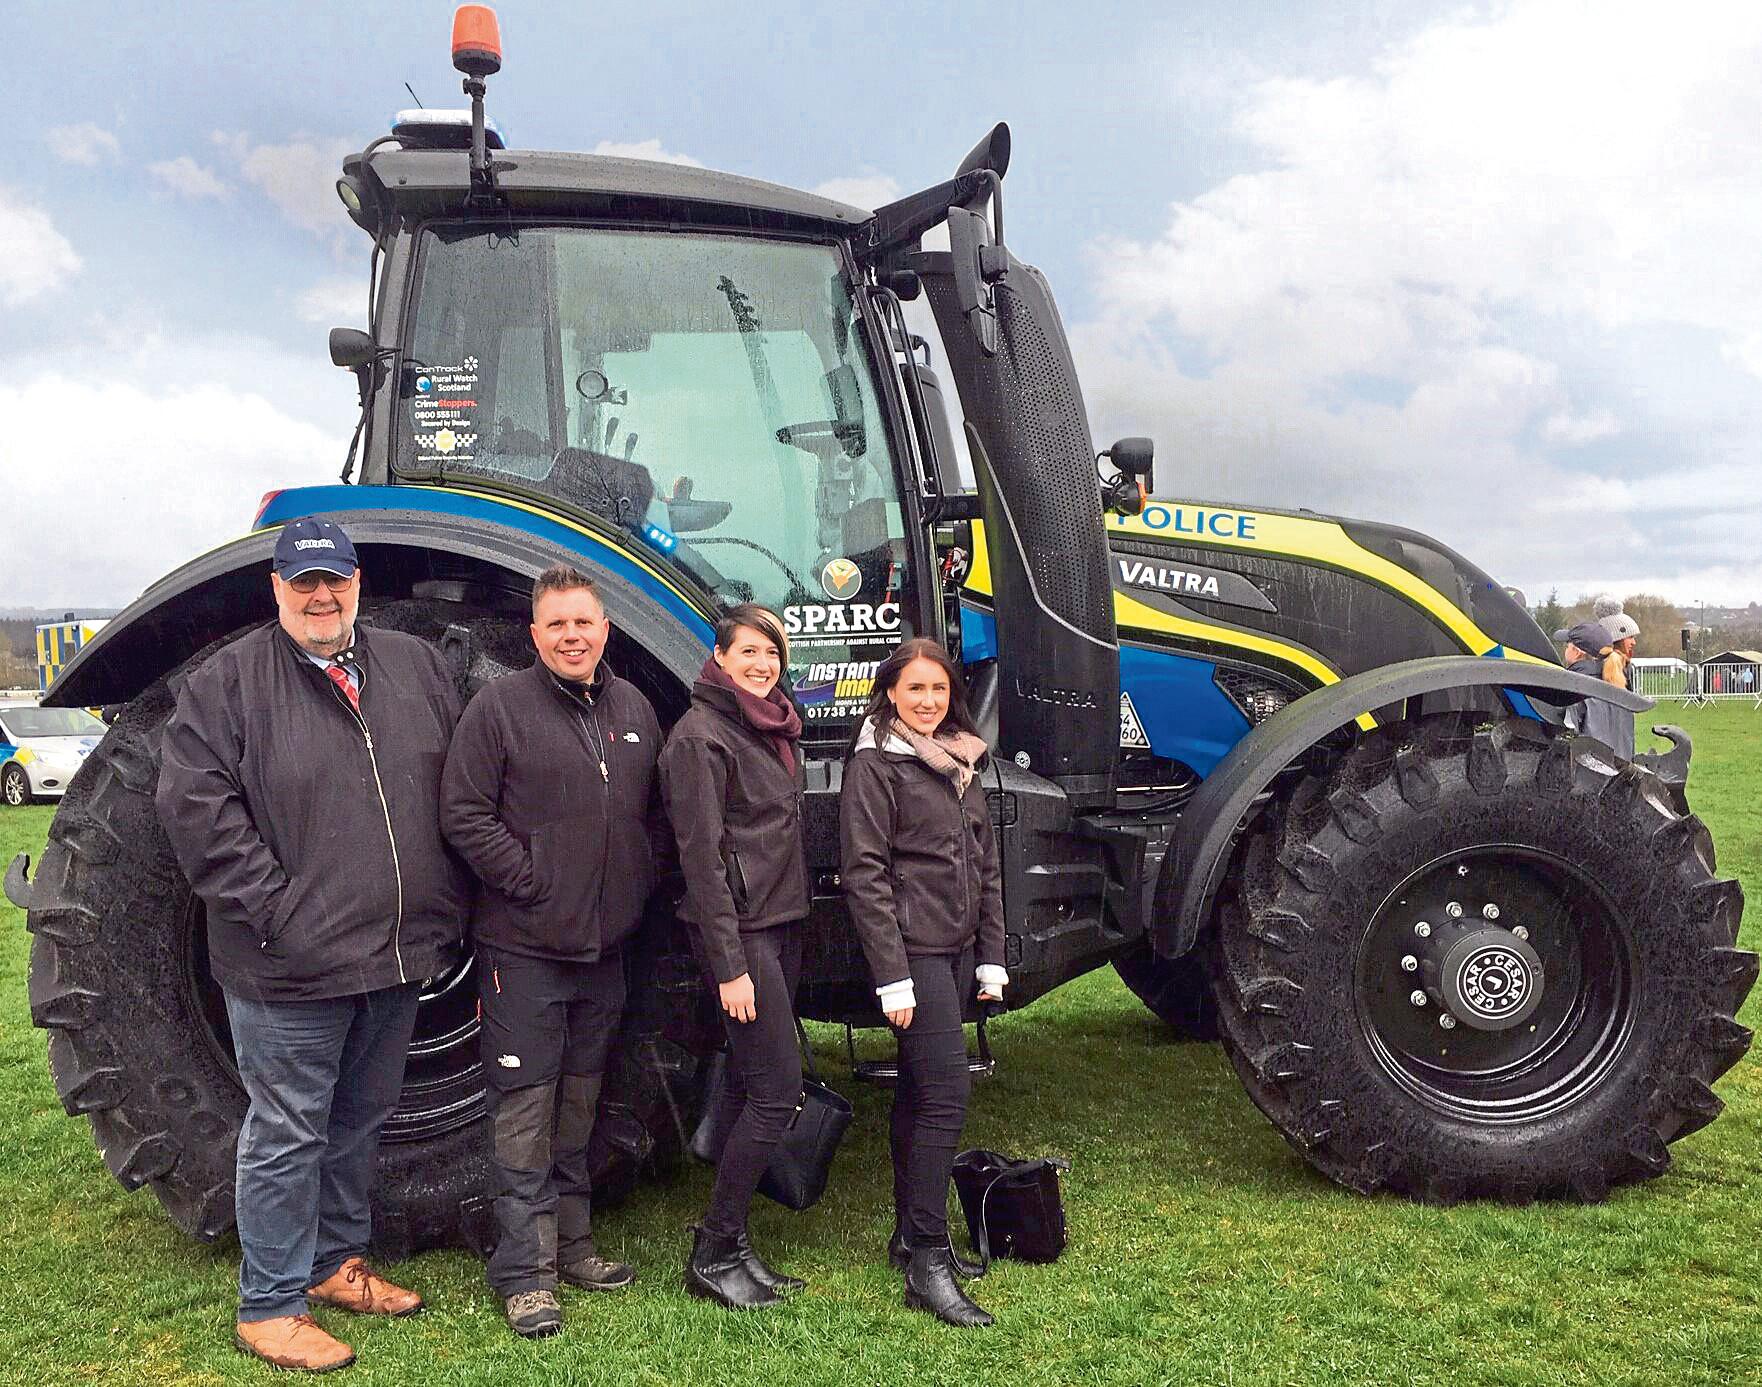 Hamilton Ross Group Valtra Expert, Brian Hamilton; Police Scotland National Rural Crime Co-ordinator, Alan Dron; Hamilton Ross Group Marketing Manager, Corrine McConnachie and Marketing Assistant, Rachel Mullin.